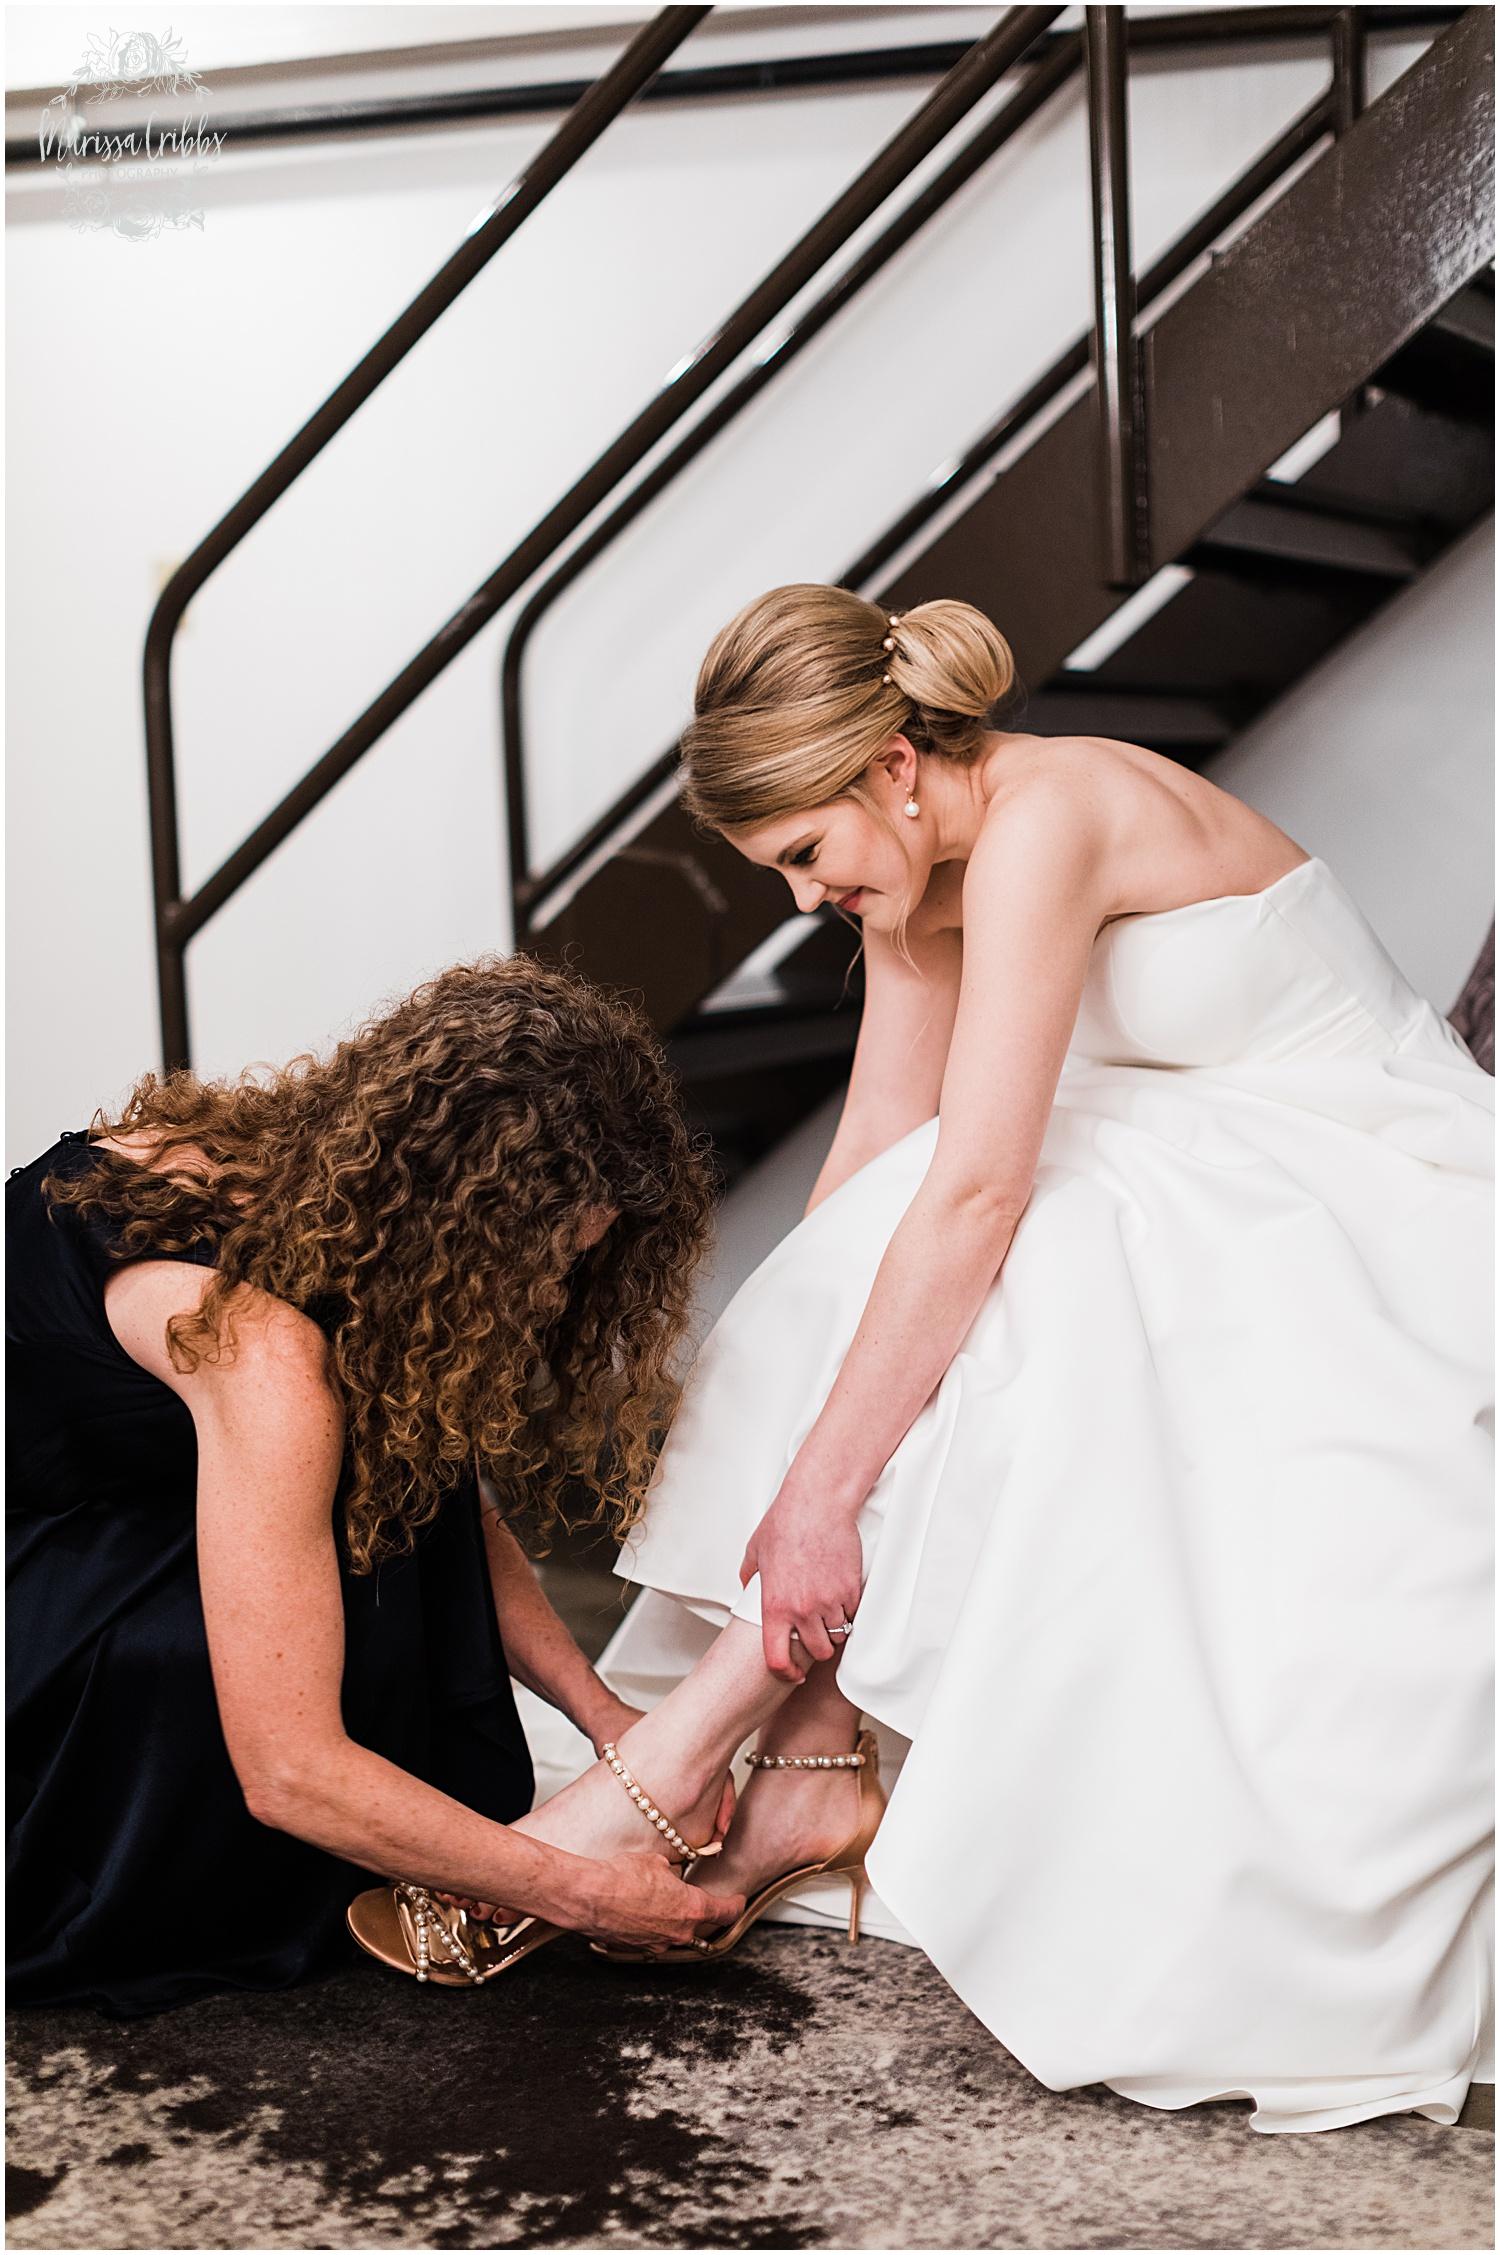 ABBY & CHARLIE WEDDING   THE HUDSON EVENT SPACE WEDDING   MARISSA CRIBBS PHOTOGRAPHY_7499.jpg